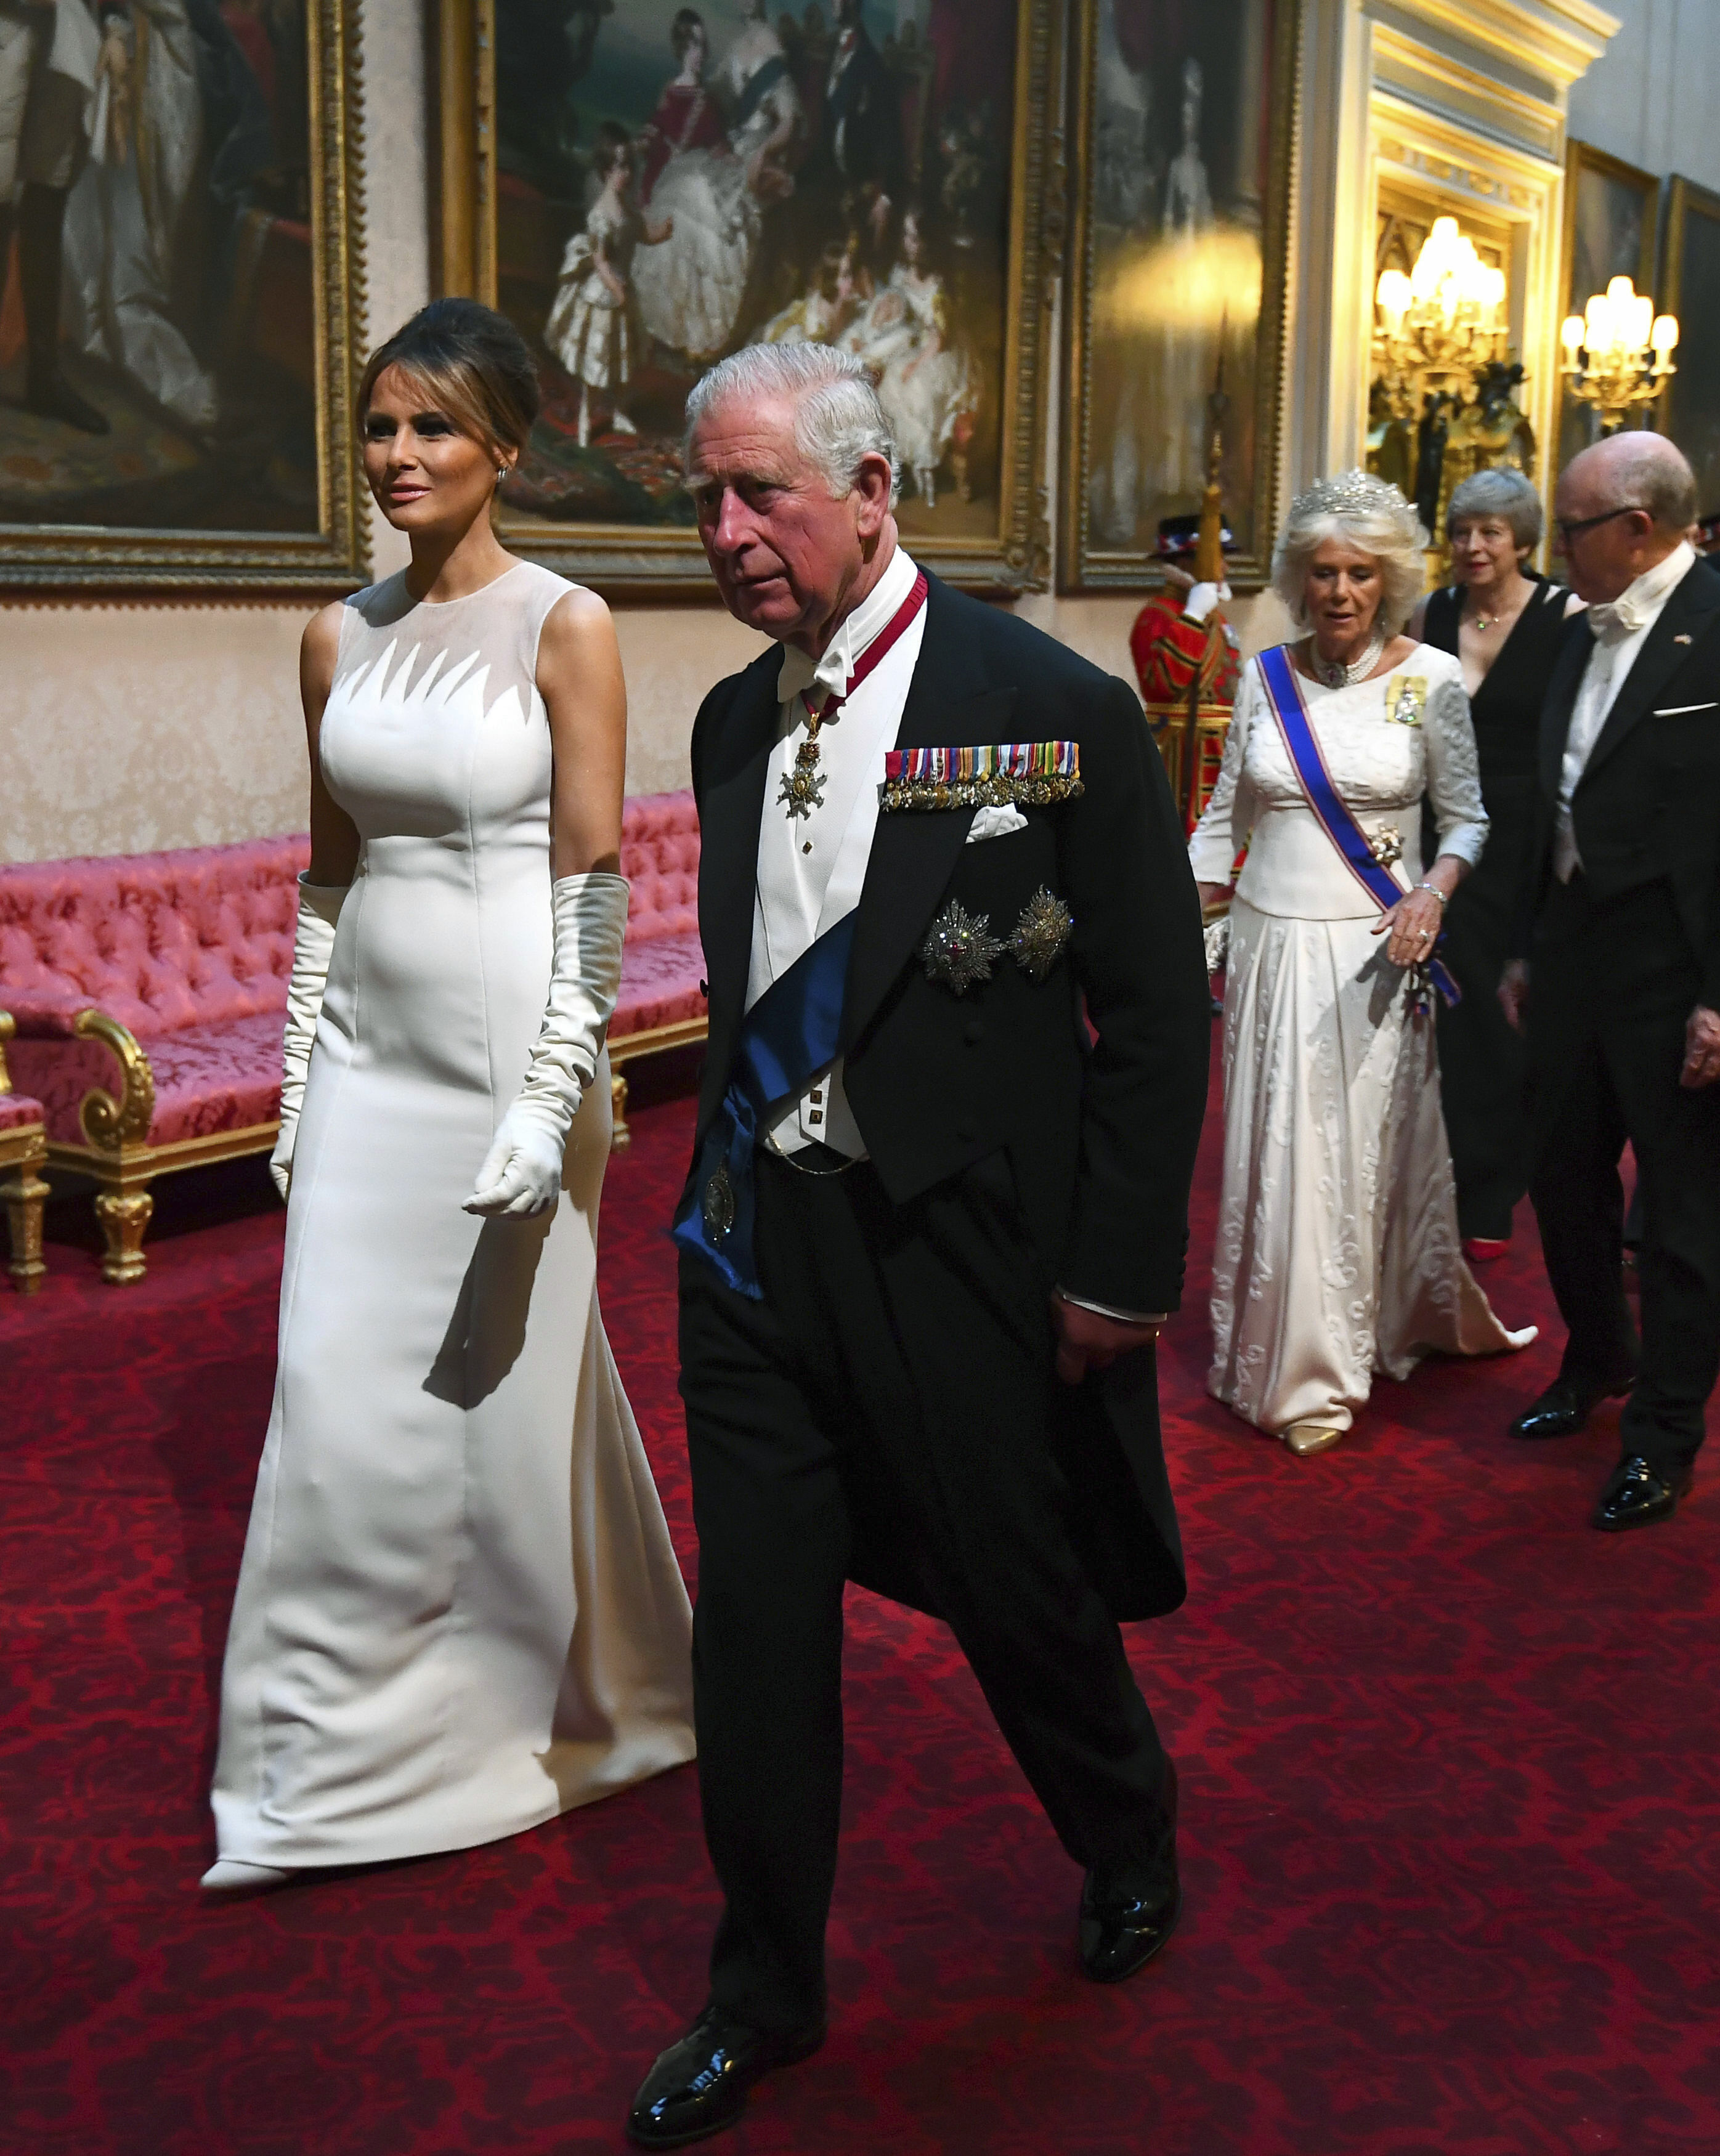 Melania usó un vestido firmado por Dior Haur Couture con escote de transparencias asimétricas. (AP)